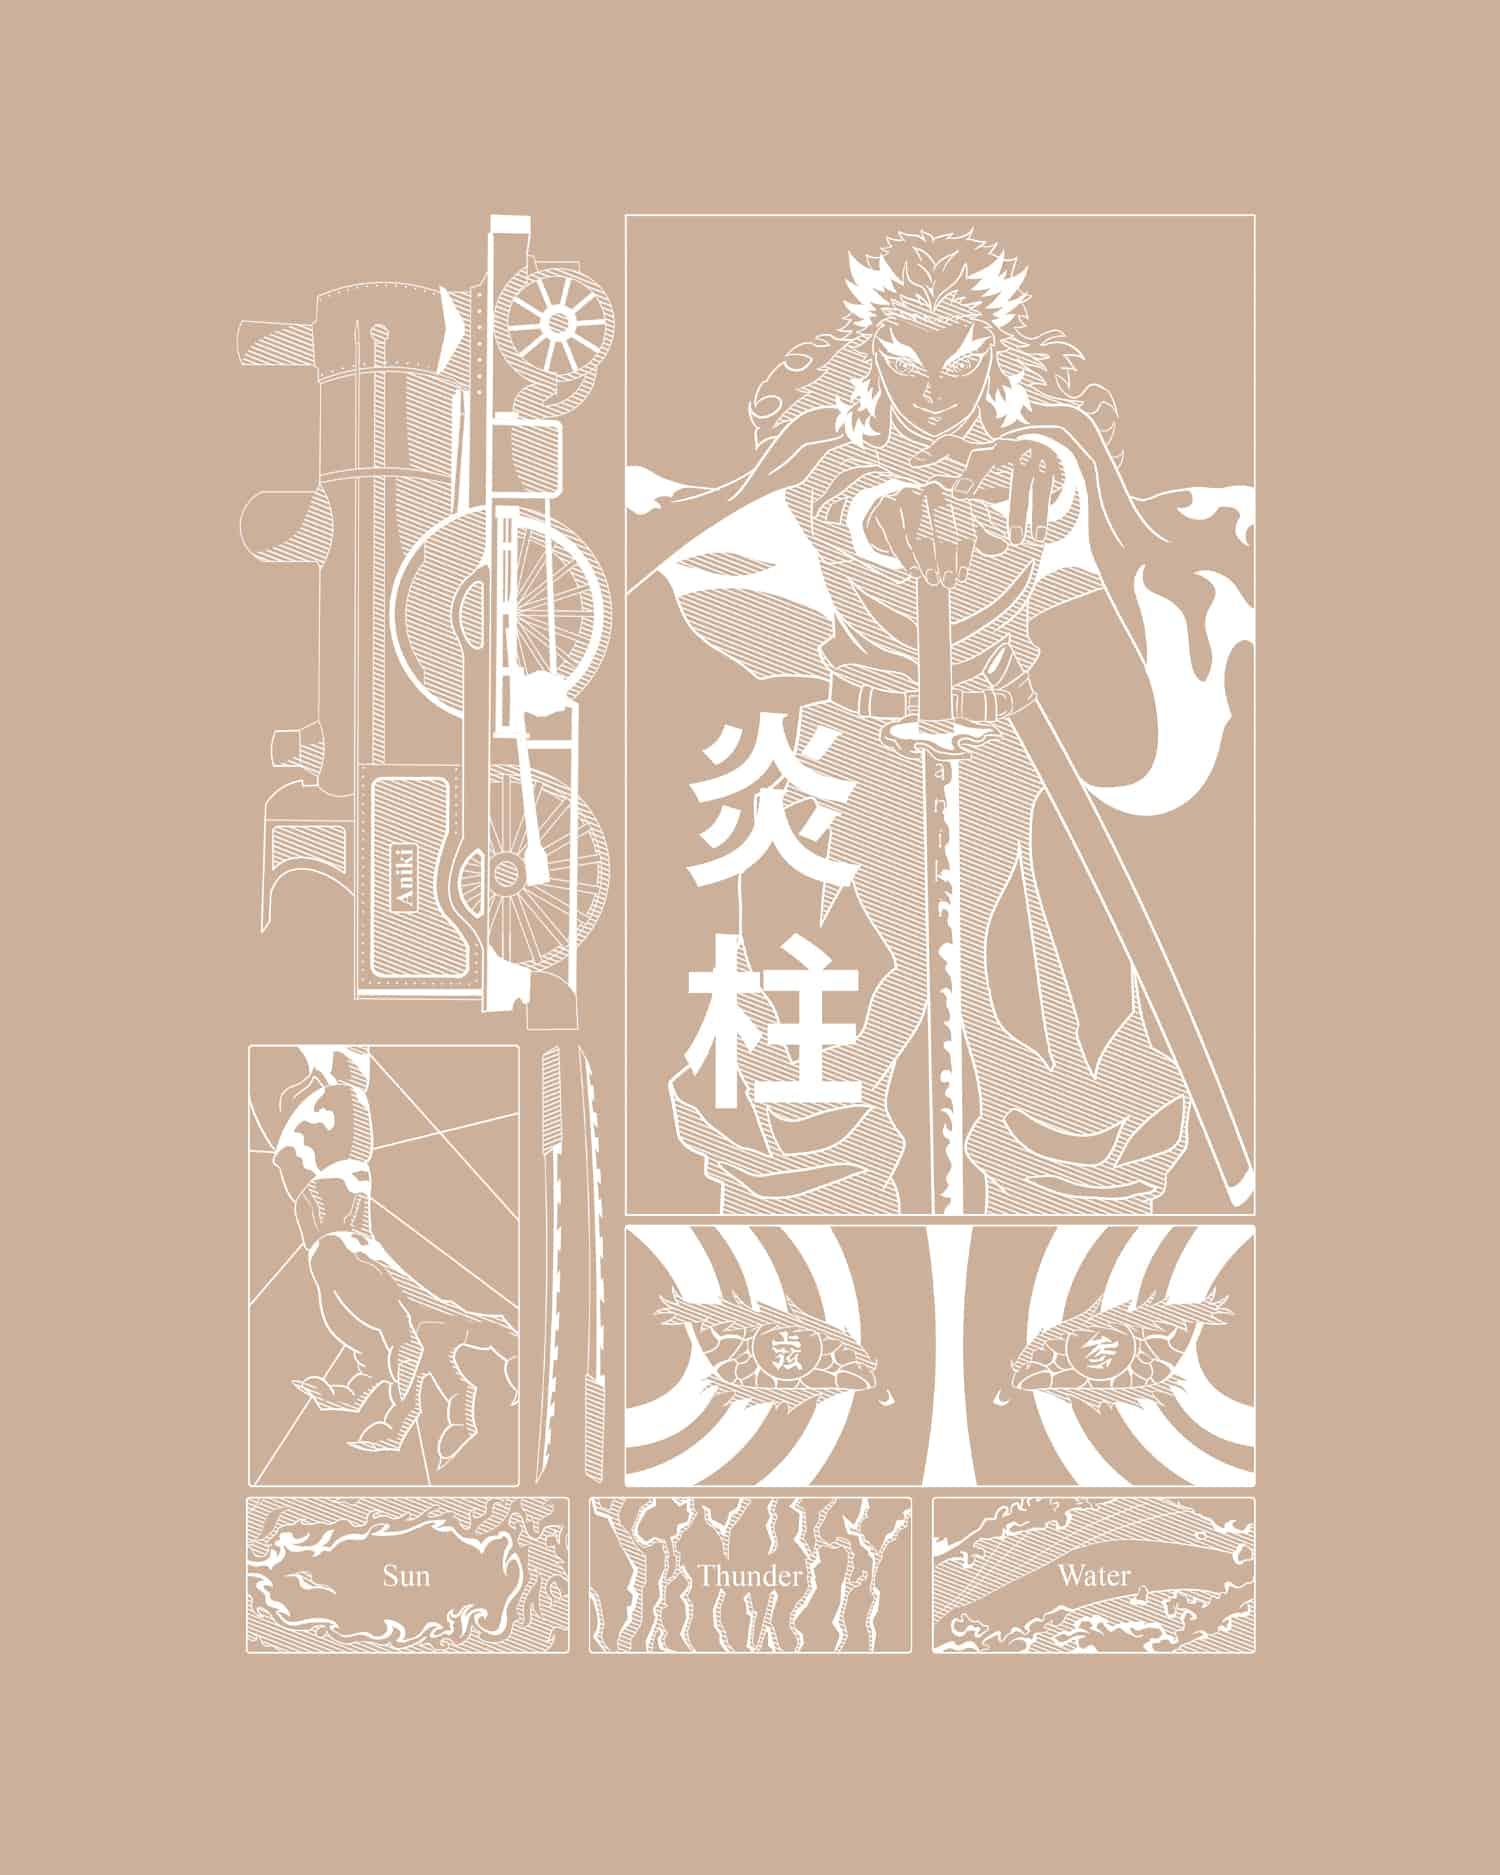 marque vêtement manga anime sweat à capuche nude demon slayer nezuko pilier train de l'infini rengoku